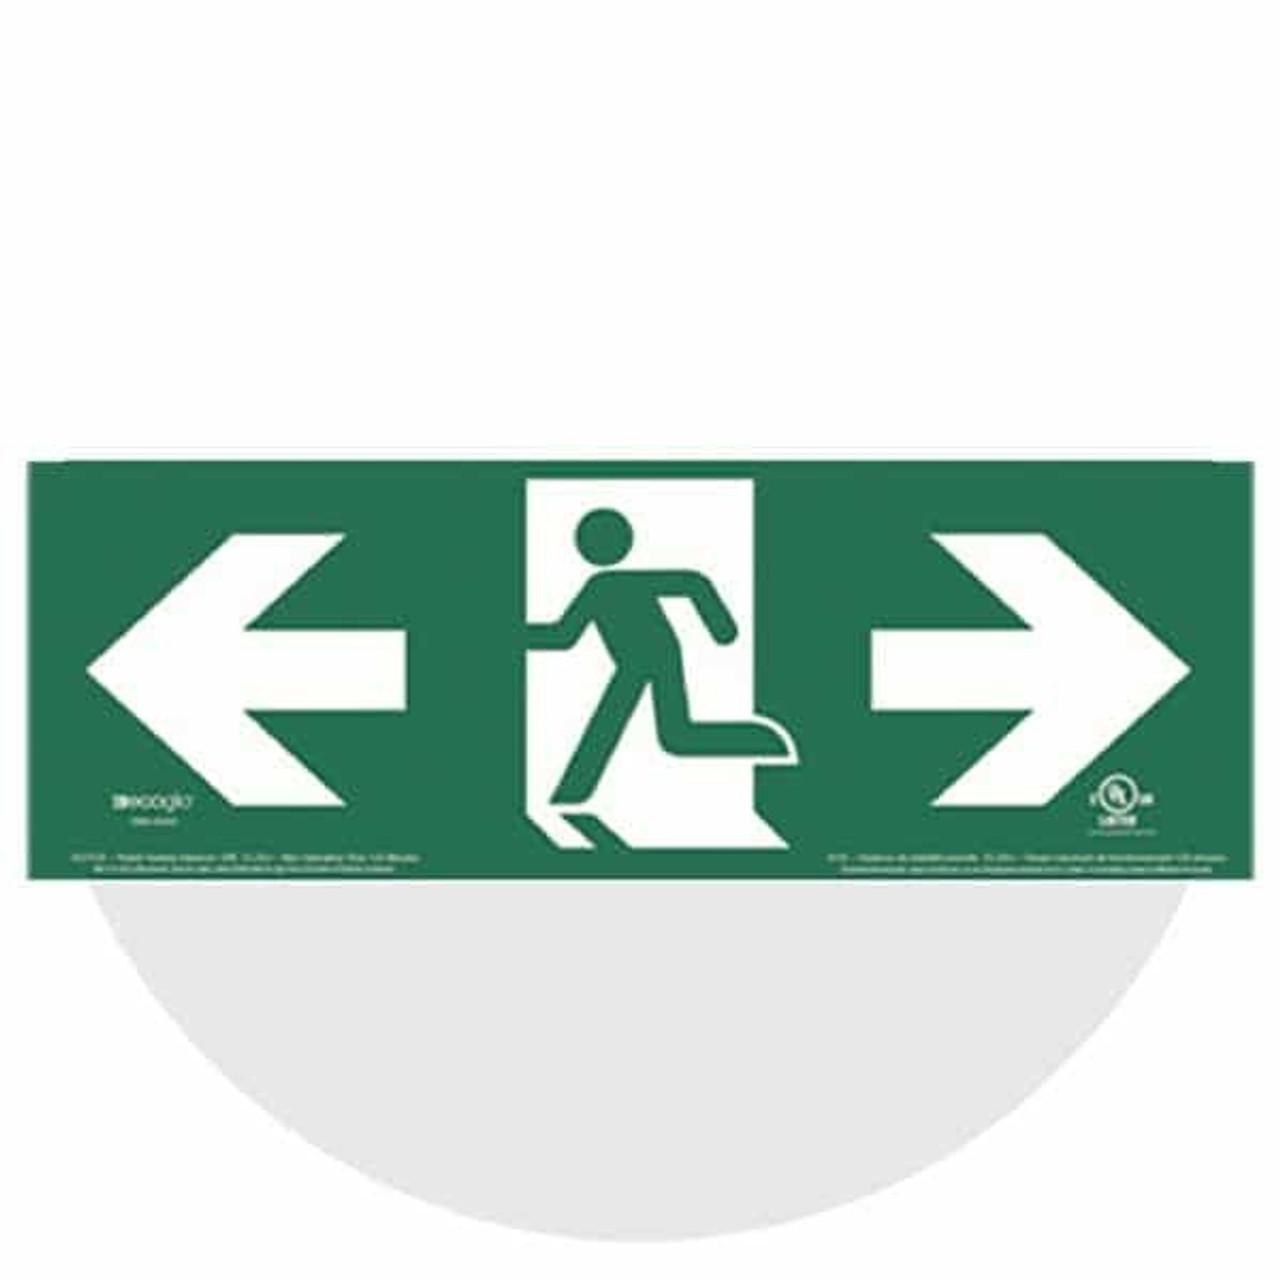 ULC Certified Photoluminescent Running Man Signs